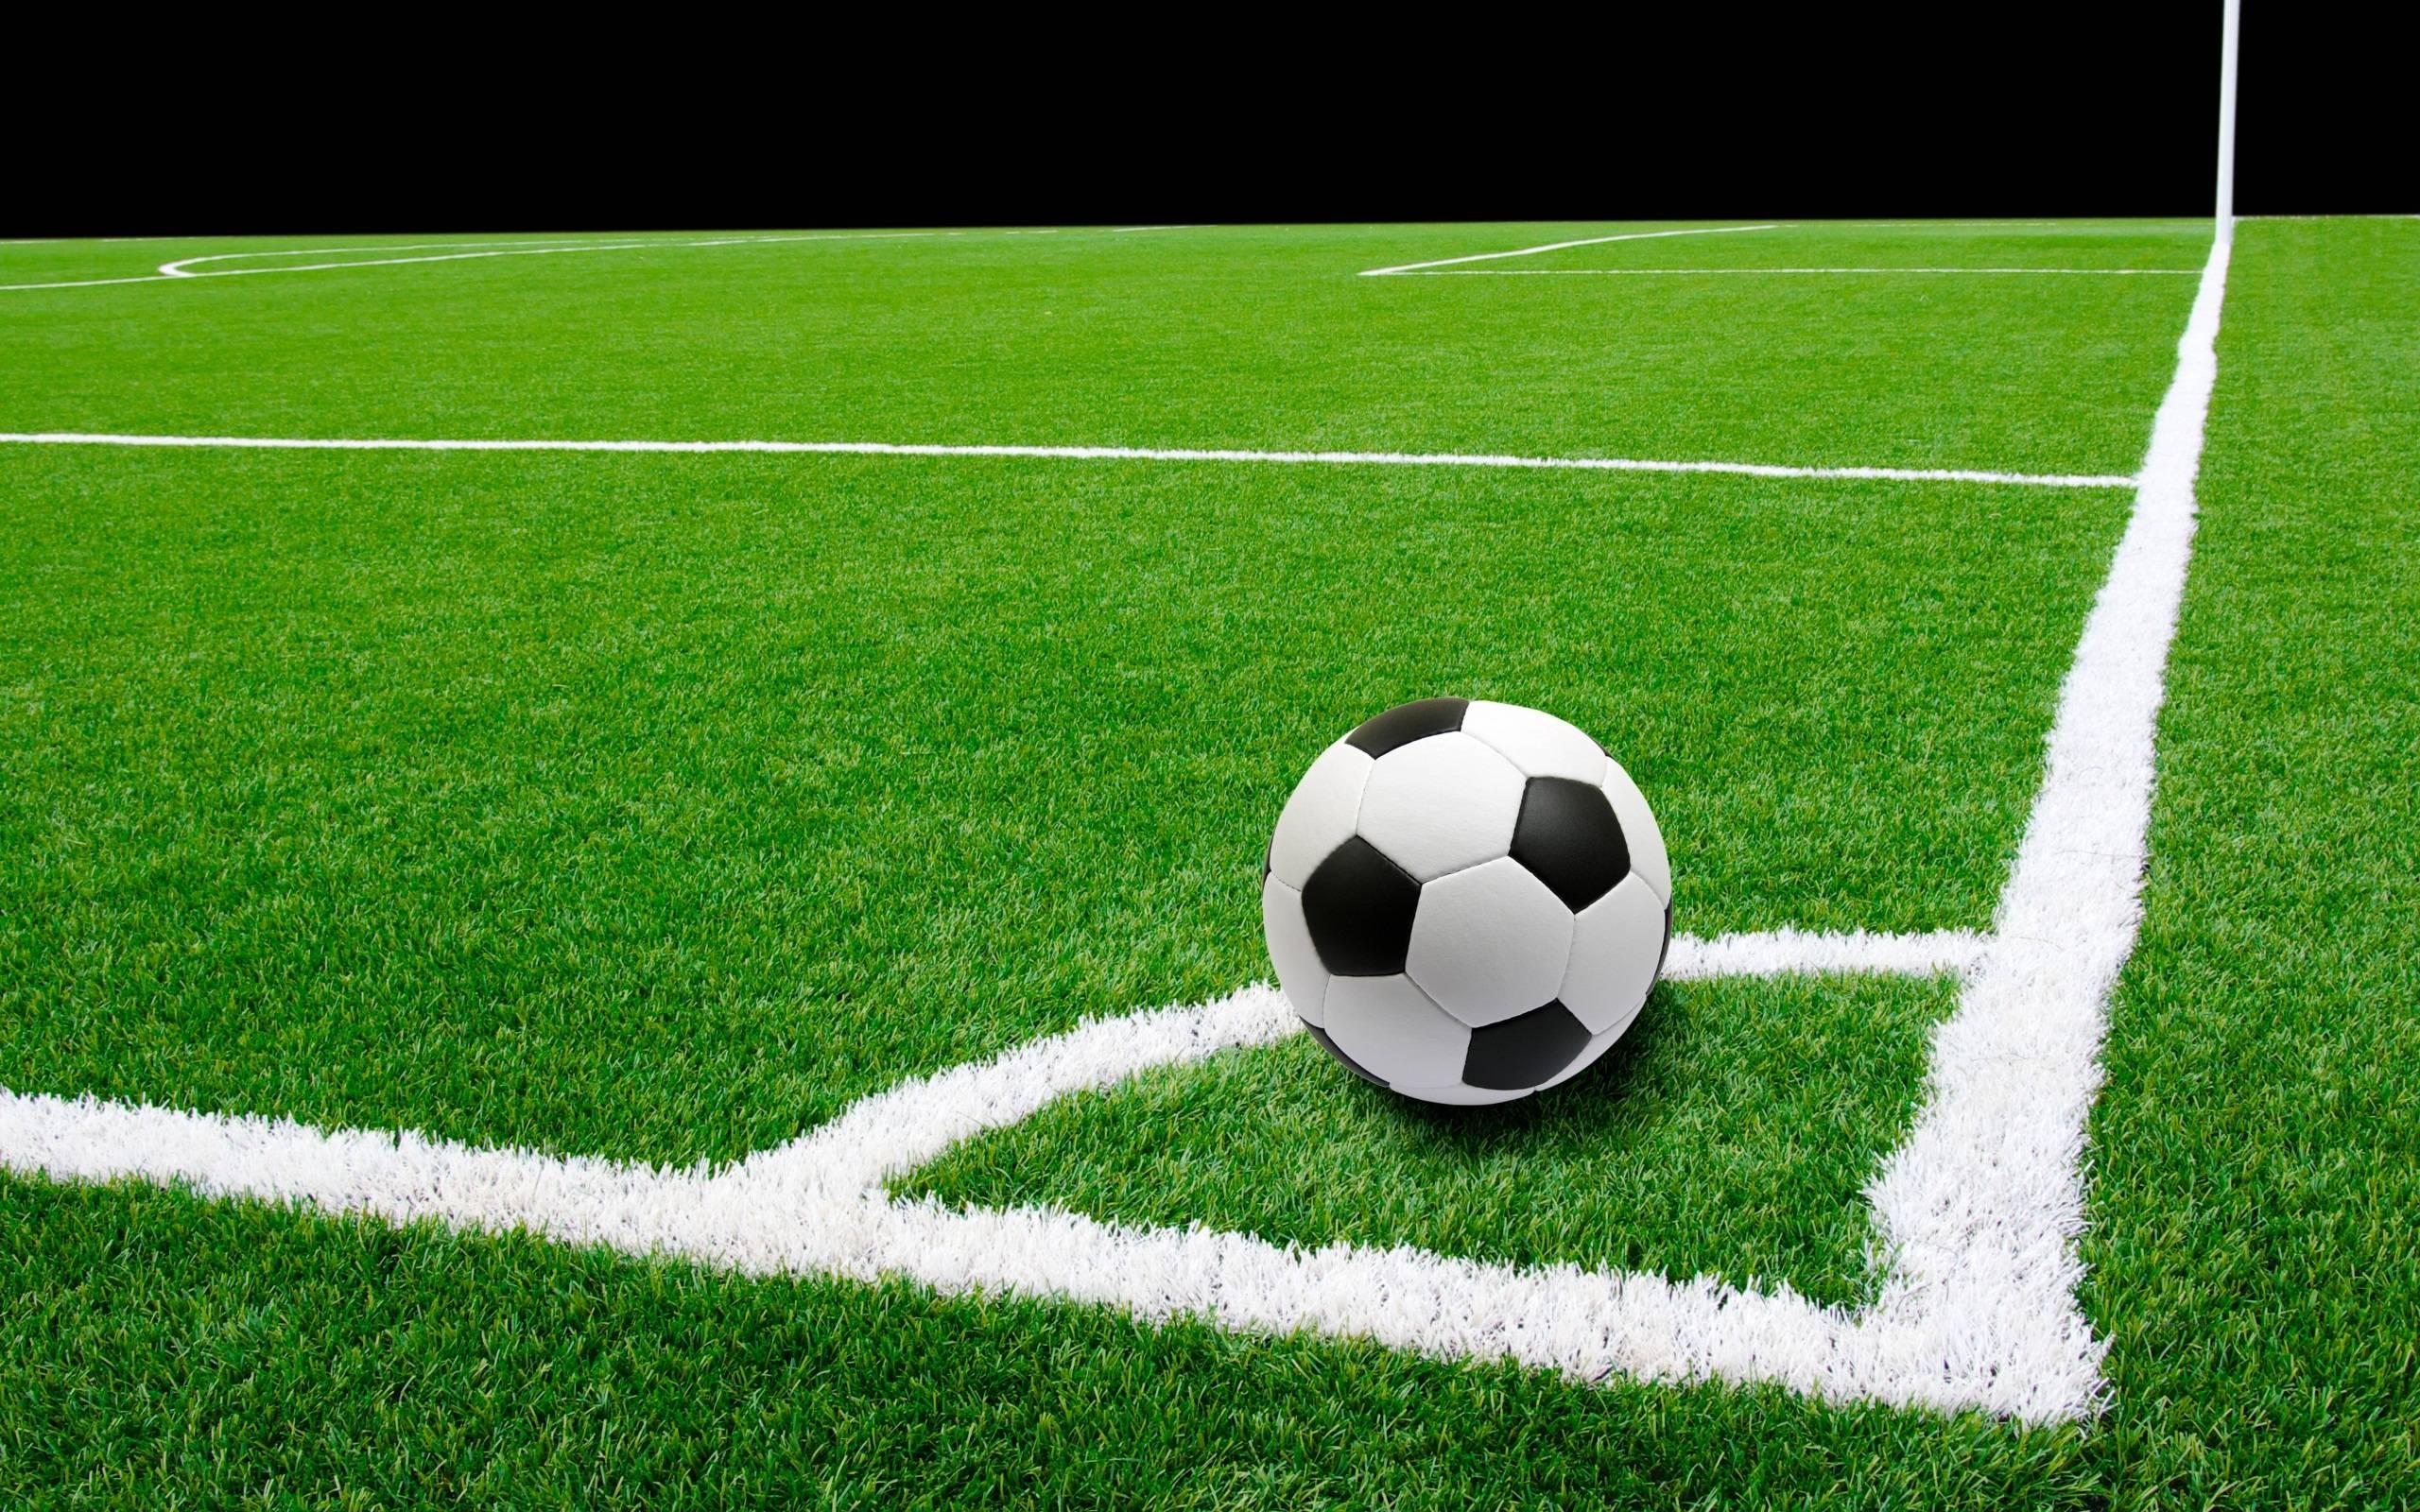 Football Field Wallpapers 2560x1600